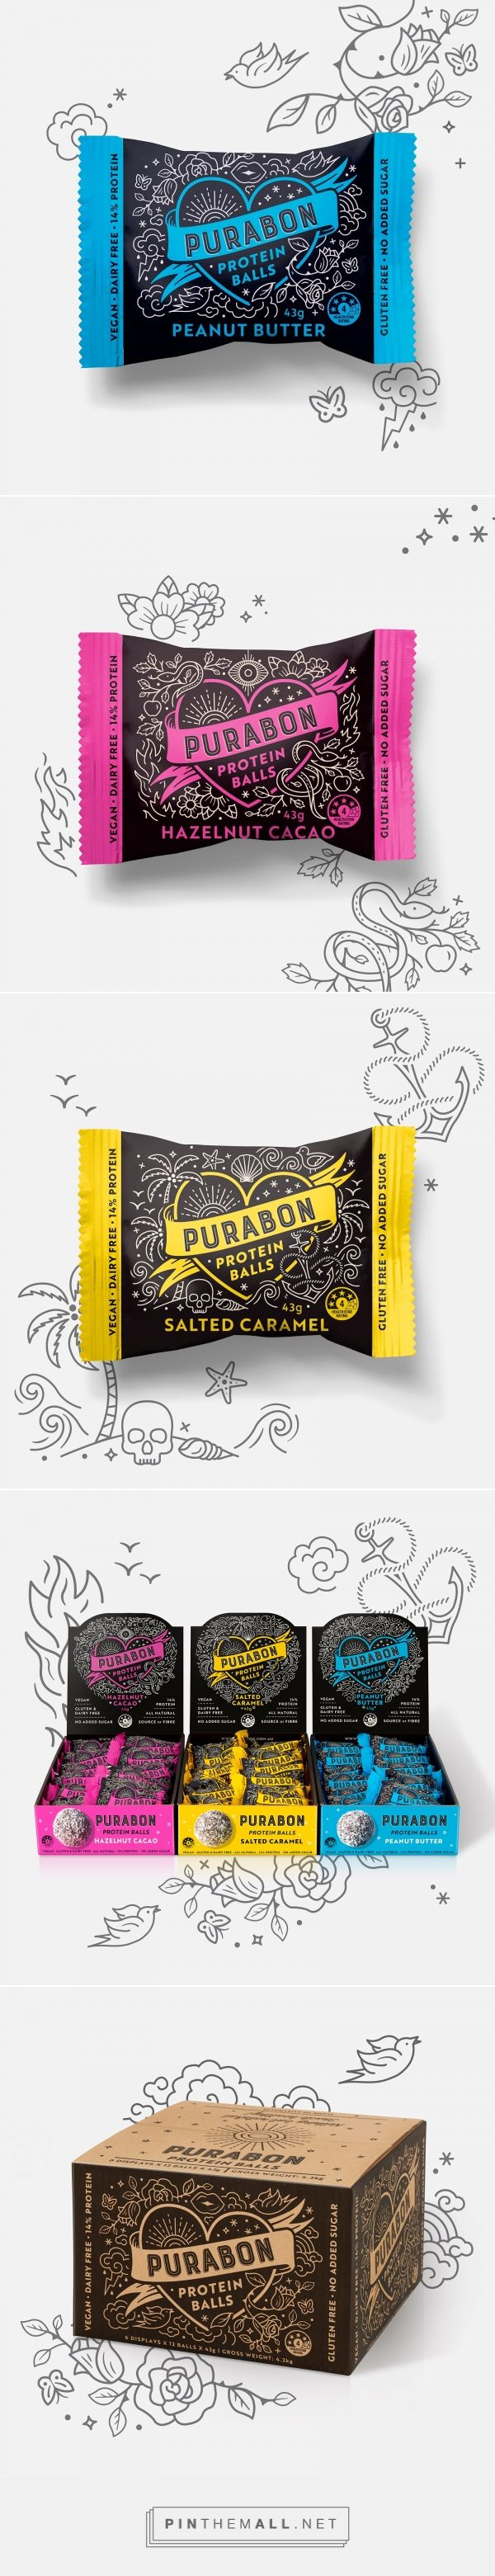 Purabon Protein Balls packaging design by Dessein - https://www.packagingoftheworld.com/2018/02/purabon-protein-balls.html